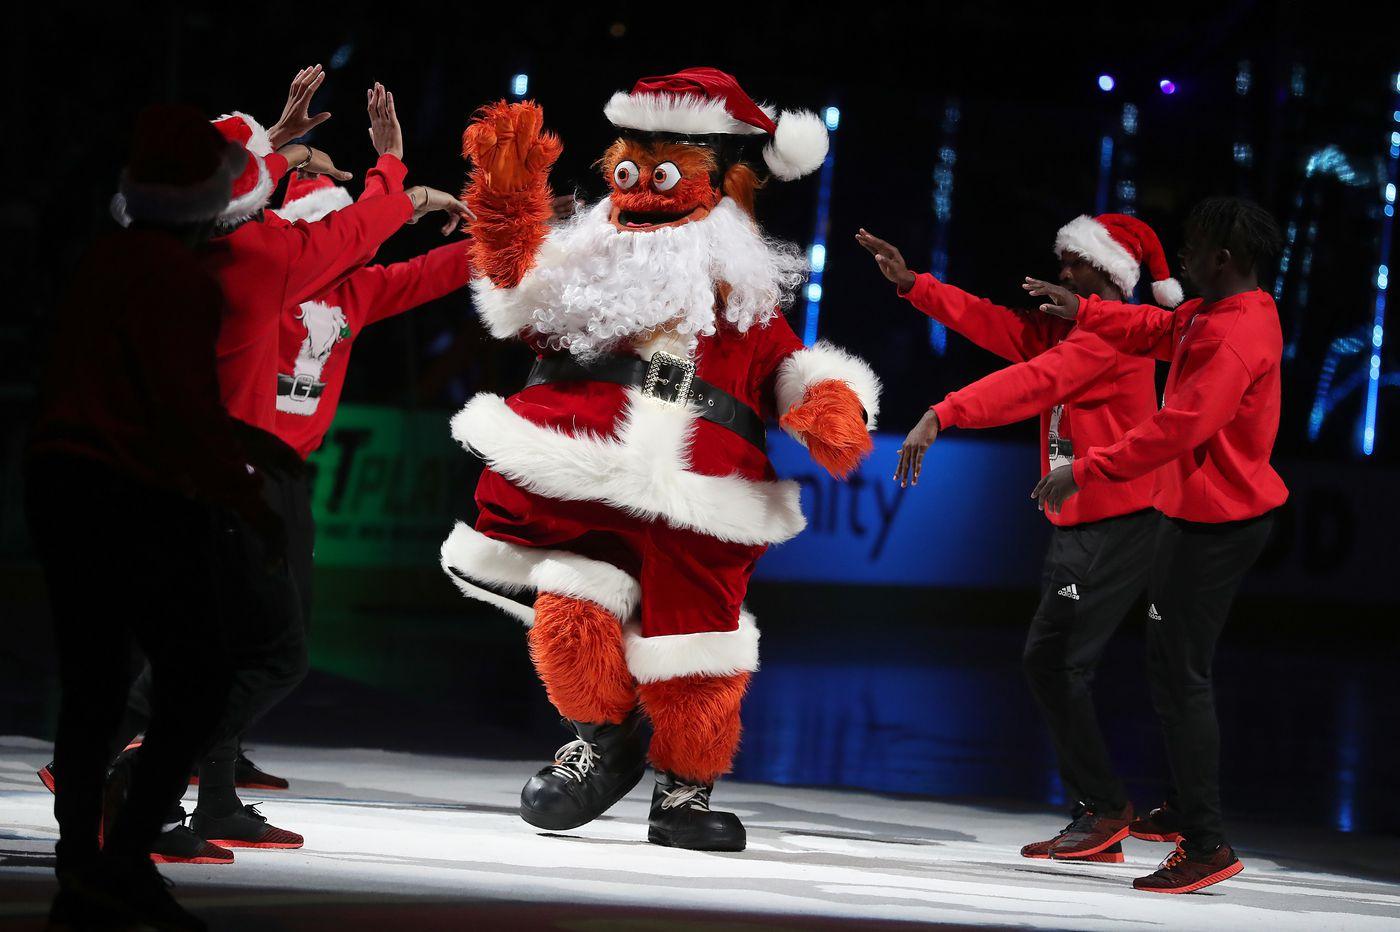 Philadelphia's week in pictures: December 24, 2018